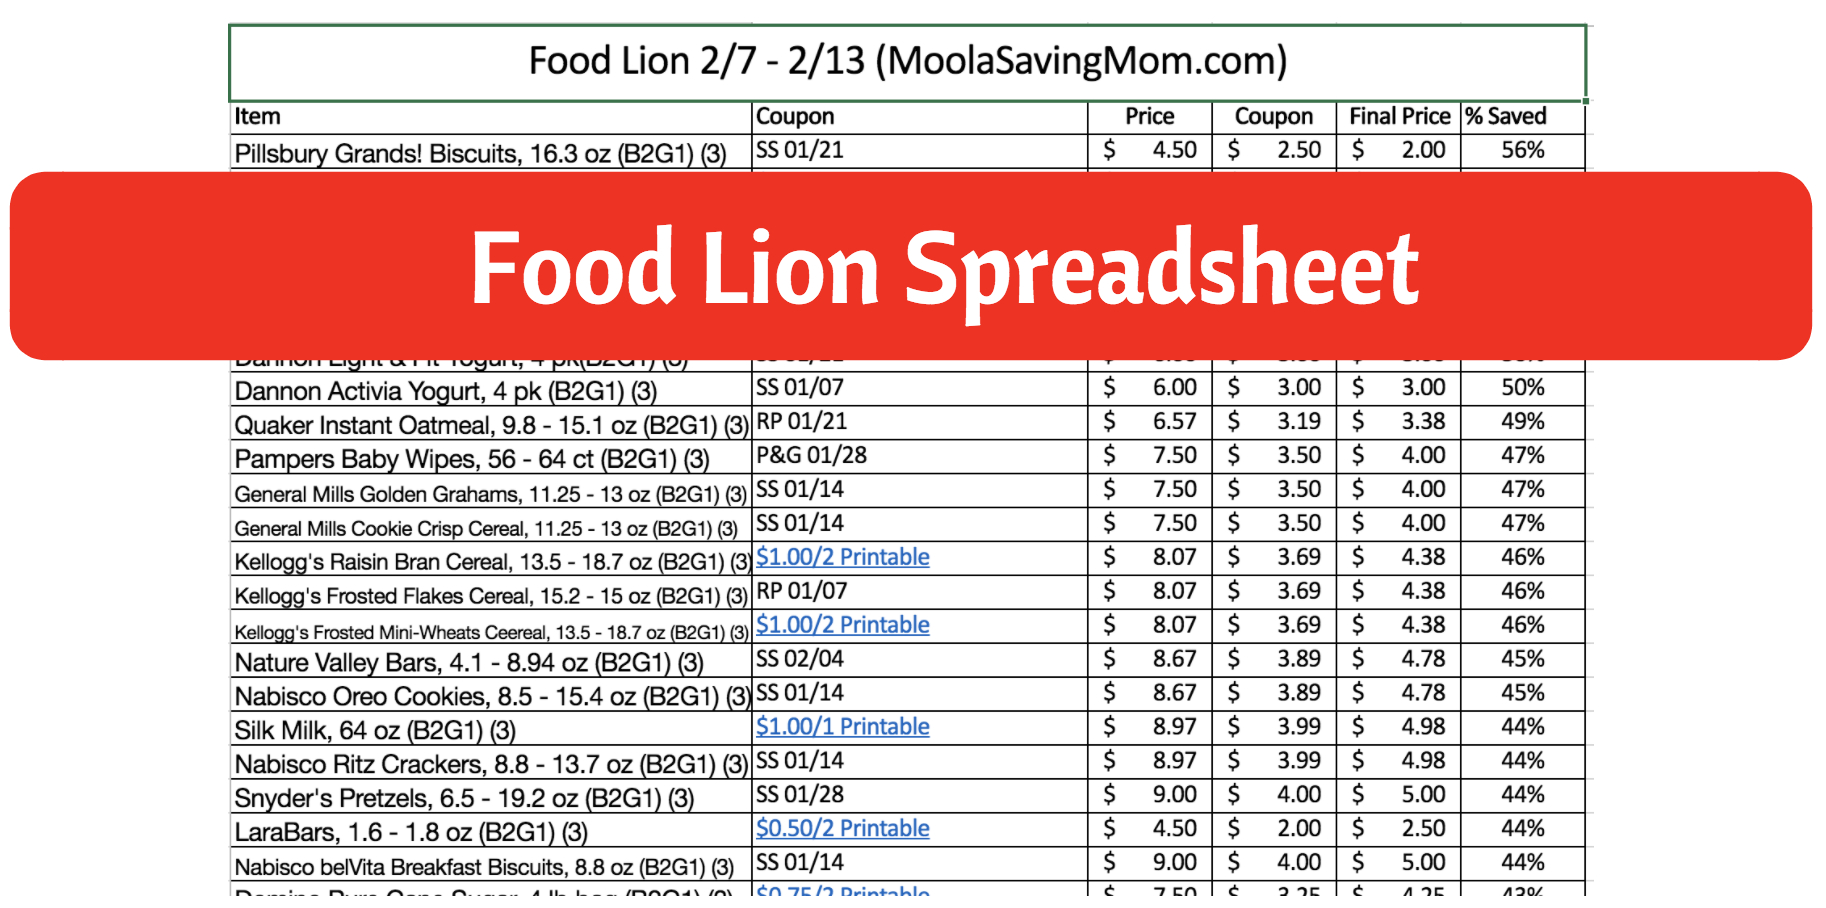 Aldi Price List Spreadsheet 2018 For Food Lion Spreadsheet 2/7  2/13  Moola Saving Mom Aldi Price List Spreadsheet 2018 Printable Spreadshee Printable Spreadshee aldi price list spreadsheet 2018